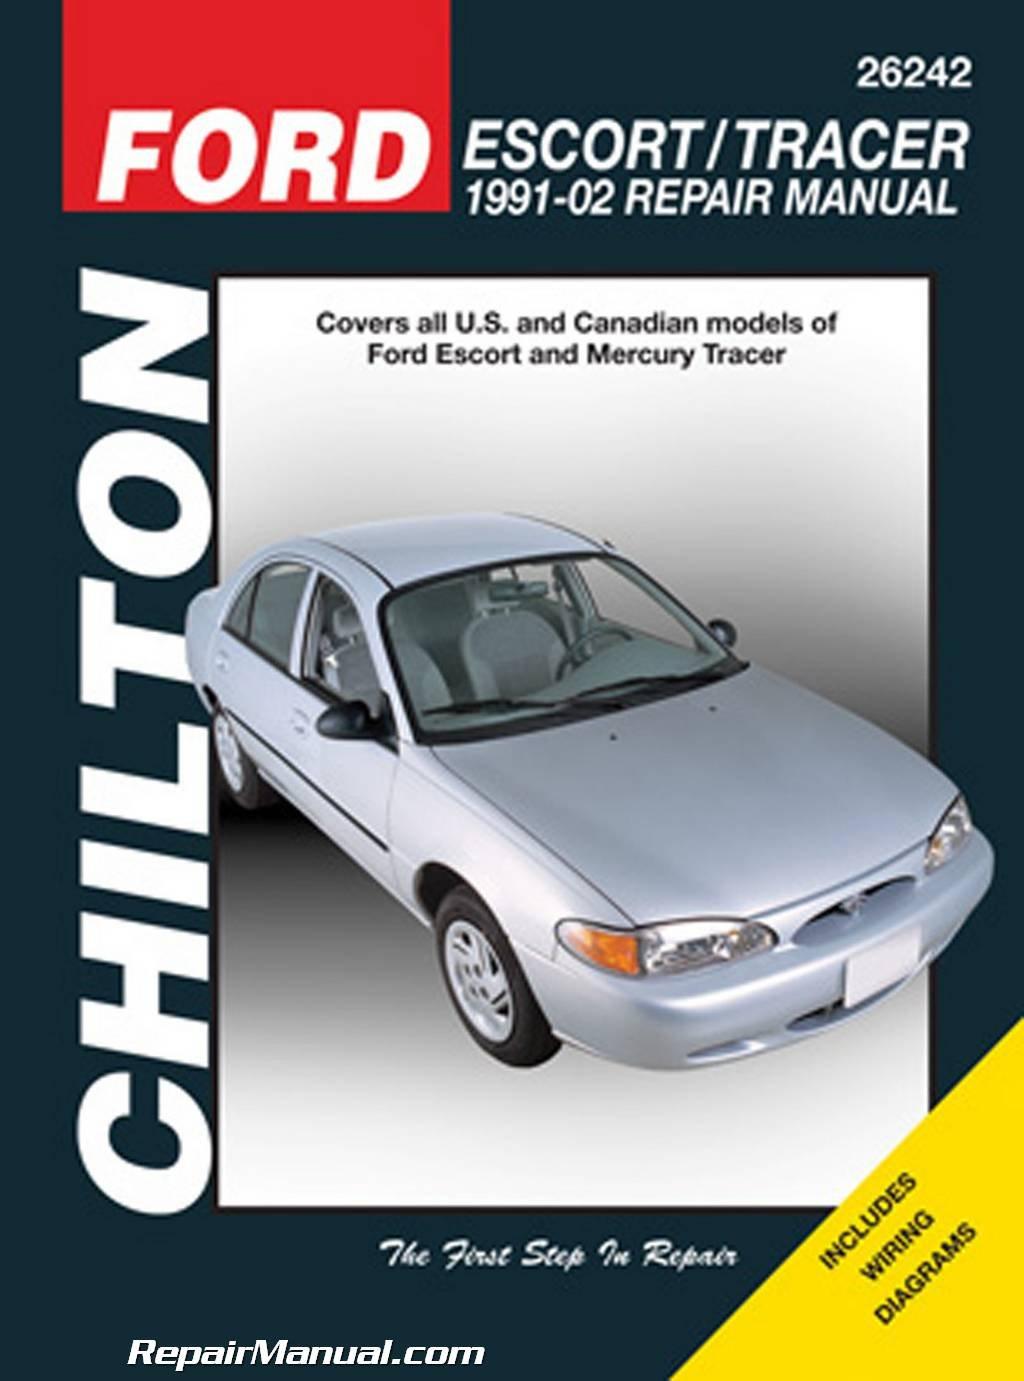 CH26242 Chilton Ford Escort & Mercury Tracer, 1991-2002 Repair Manual:  Manufacturer: Amazon.com: Books